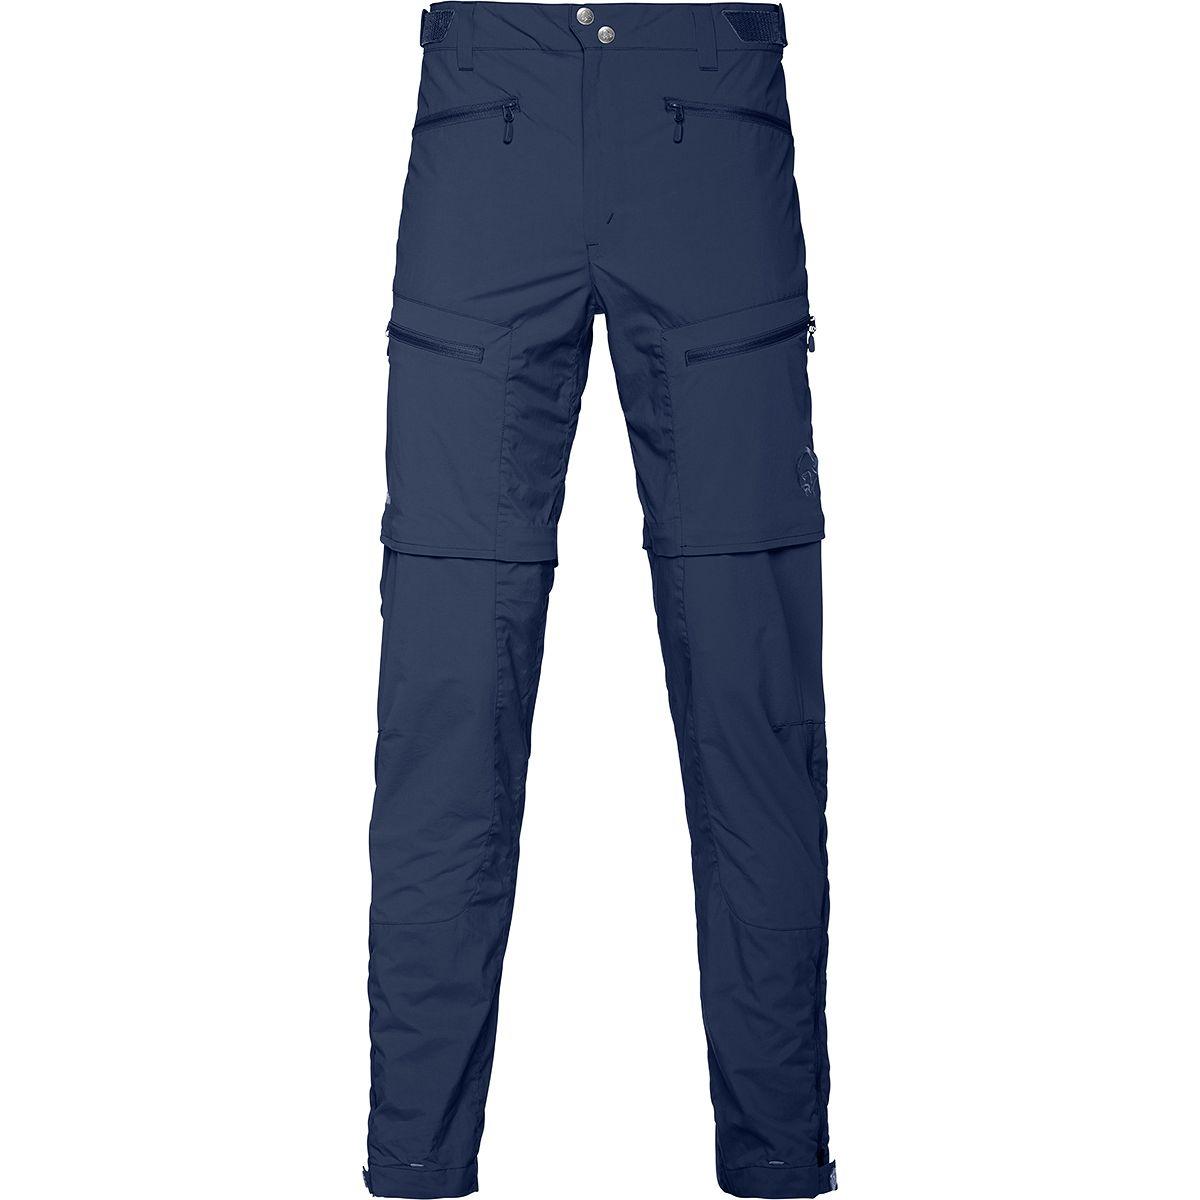 Norrona Bitihorn Flex1 Zip-Off Pant